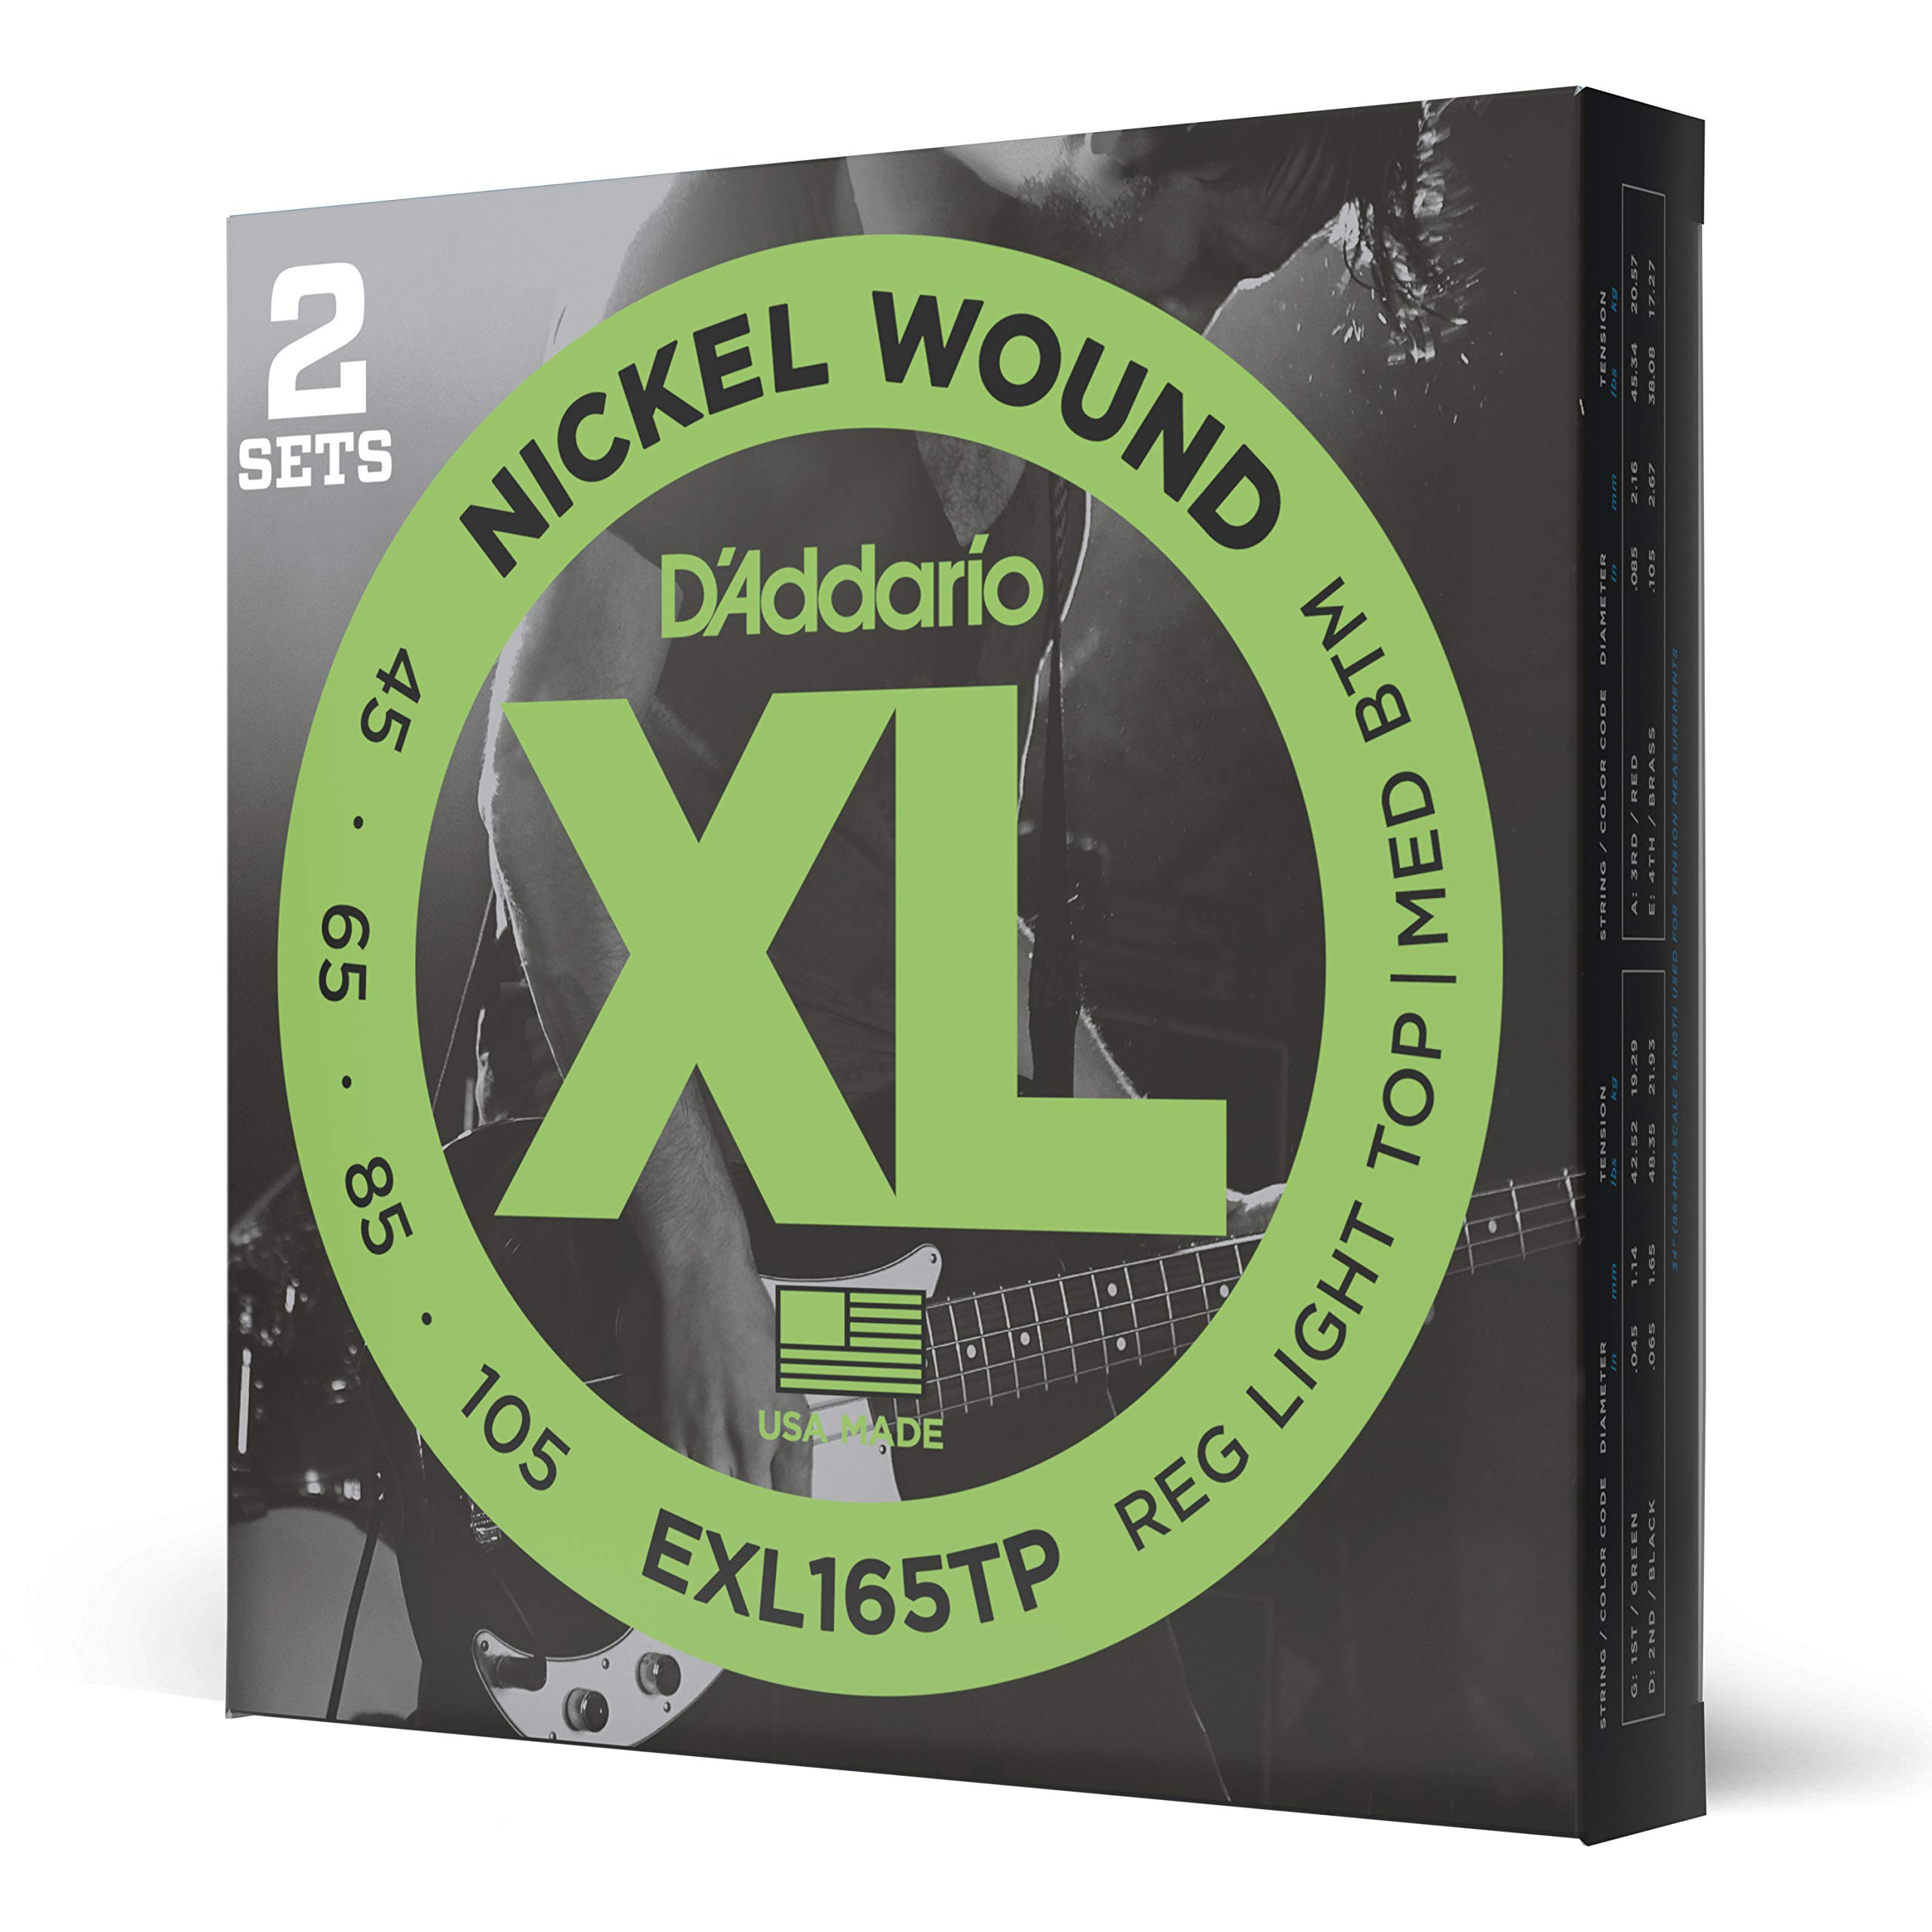 D'Addario EXL165TP Nickel Wound Bass Guitar Strings, Custom Light, 45-105, 2 Sets, Long Scale